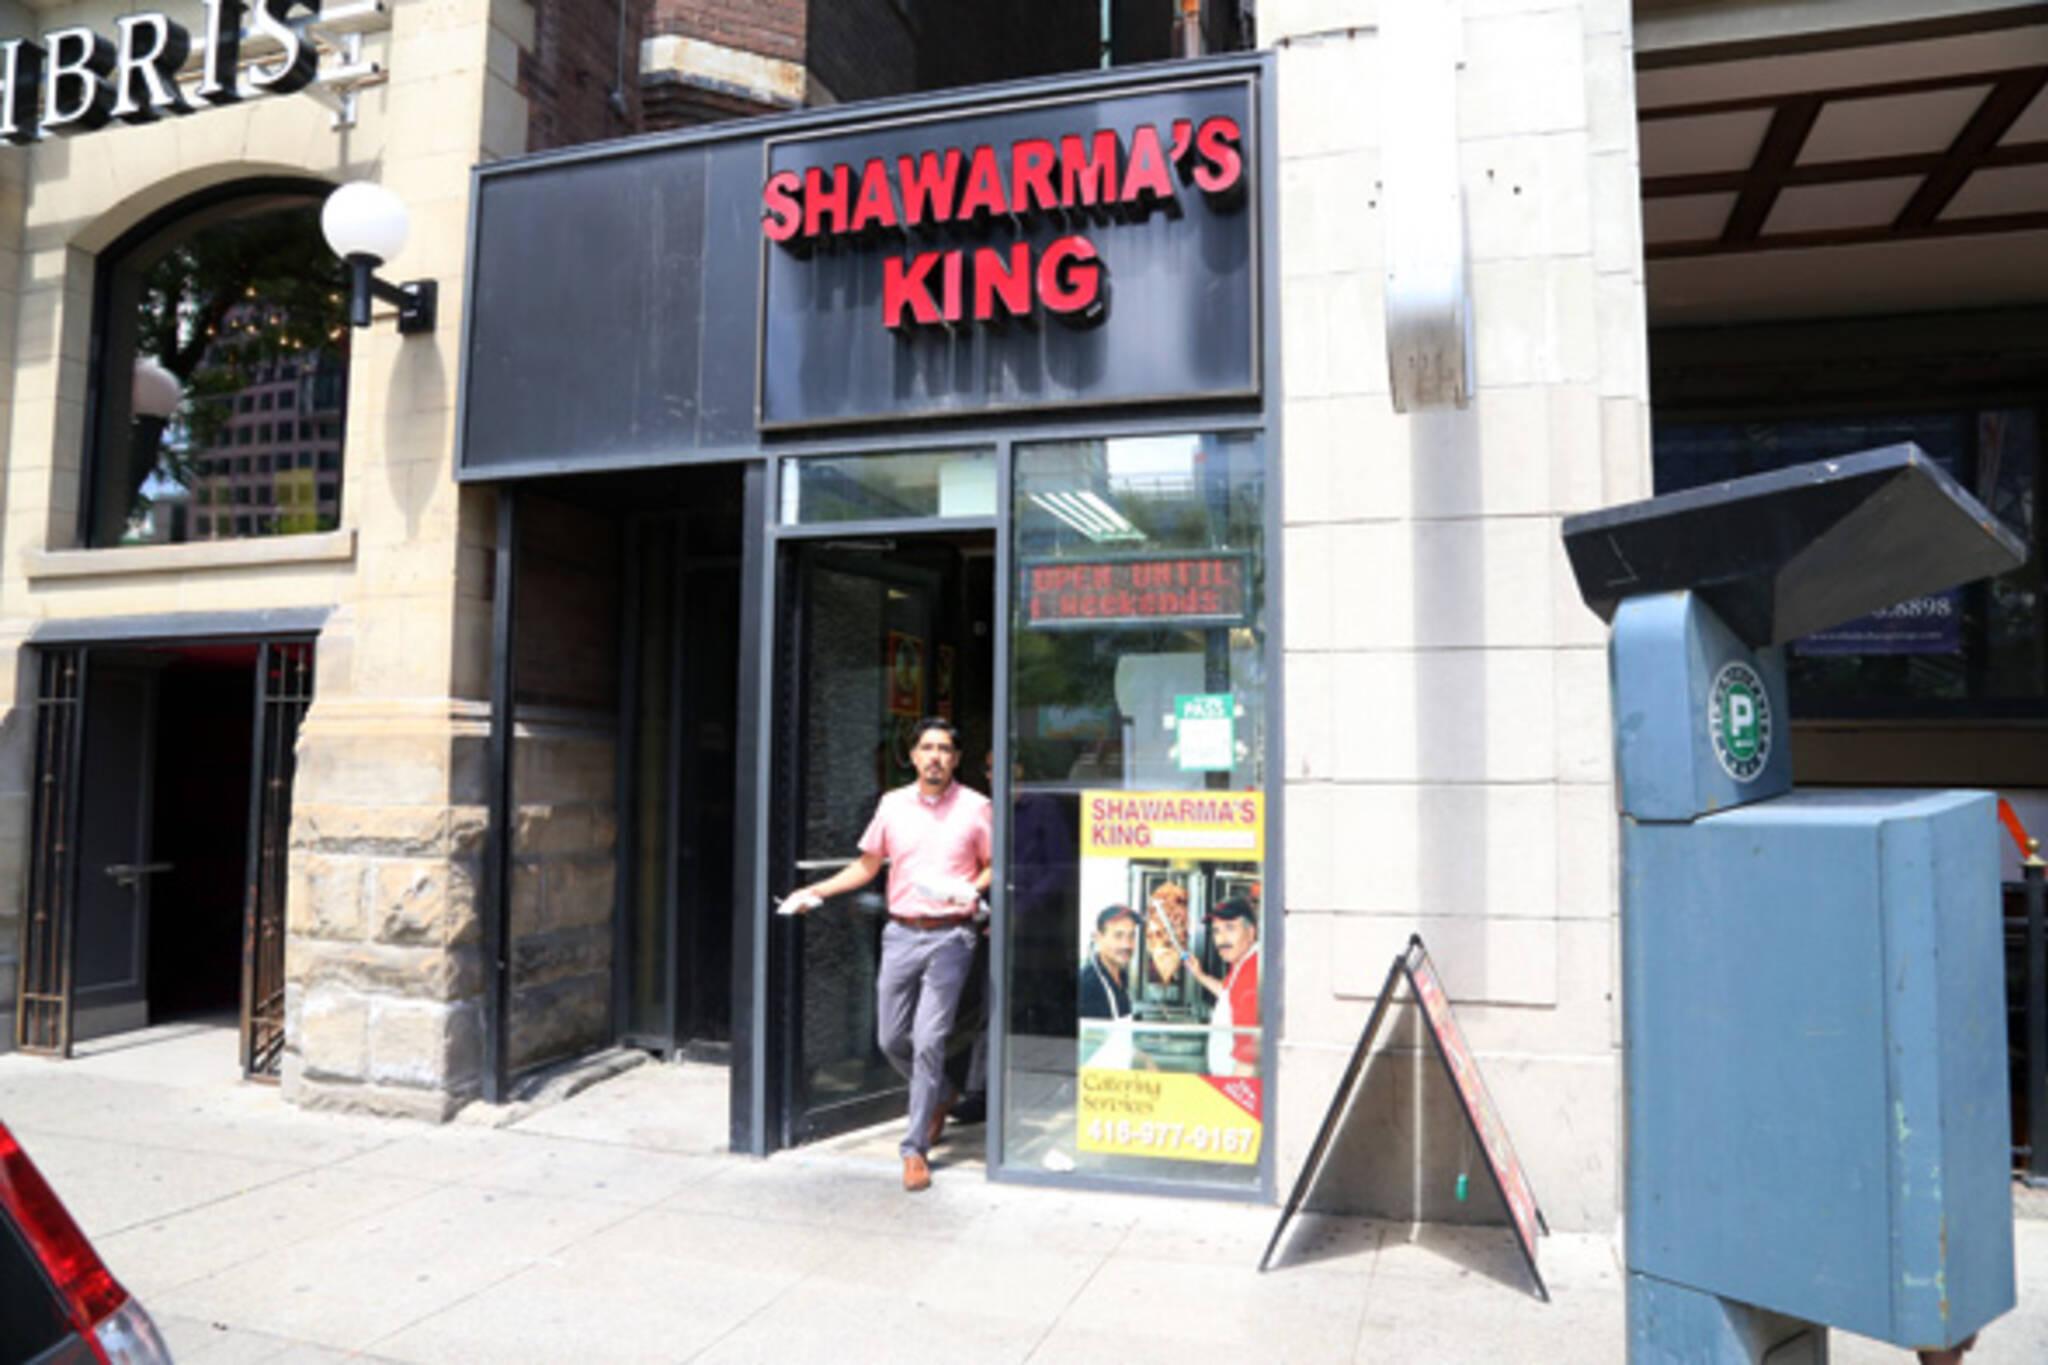 Shawarmas King King West